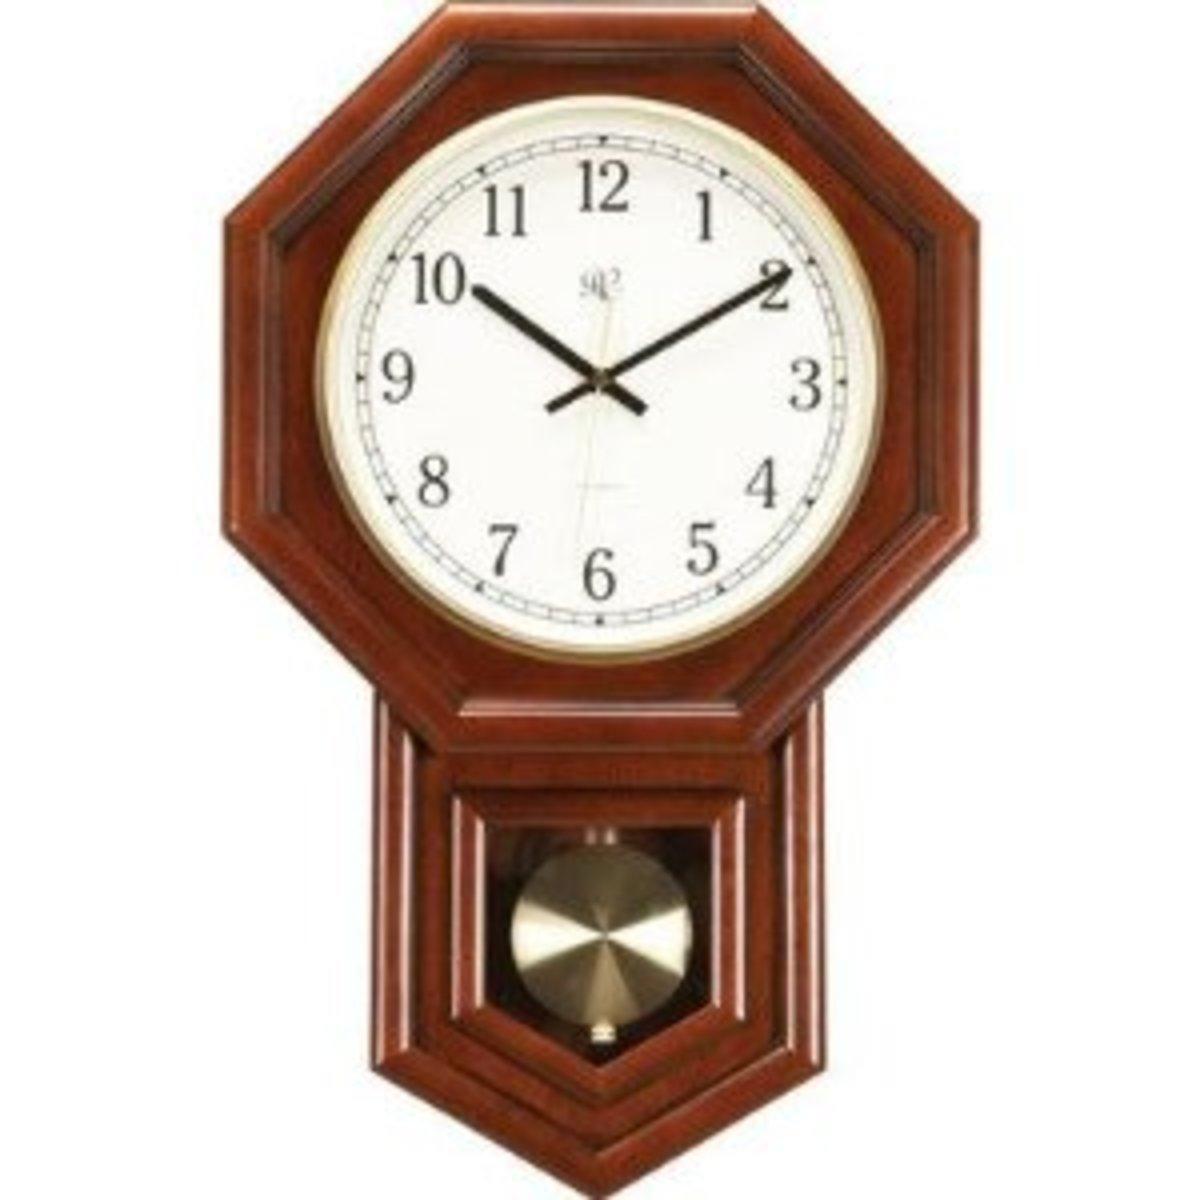 River City Clocks 801-403C 21-Inch Radio-controlled Schoolhouse Clock